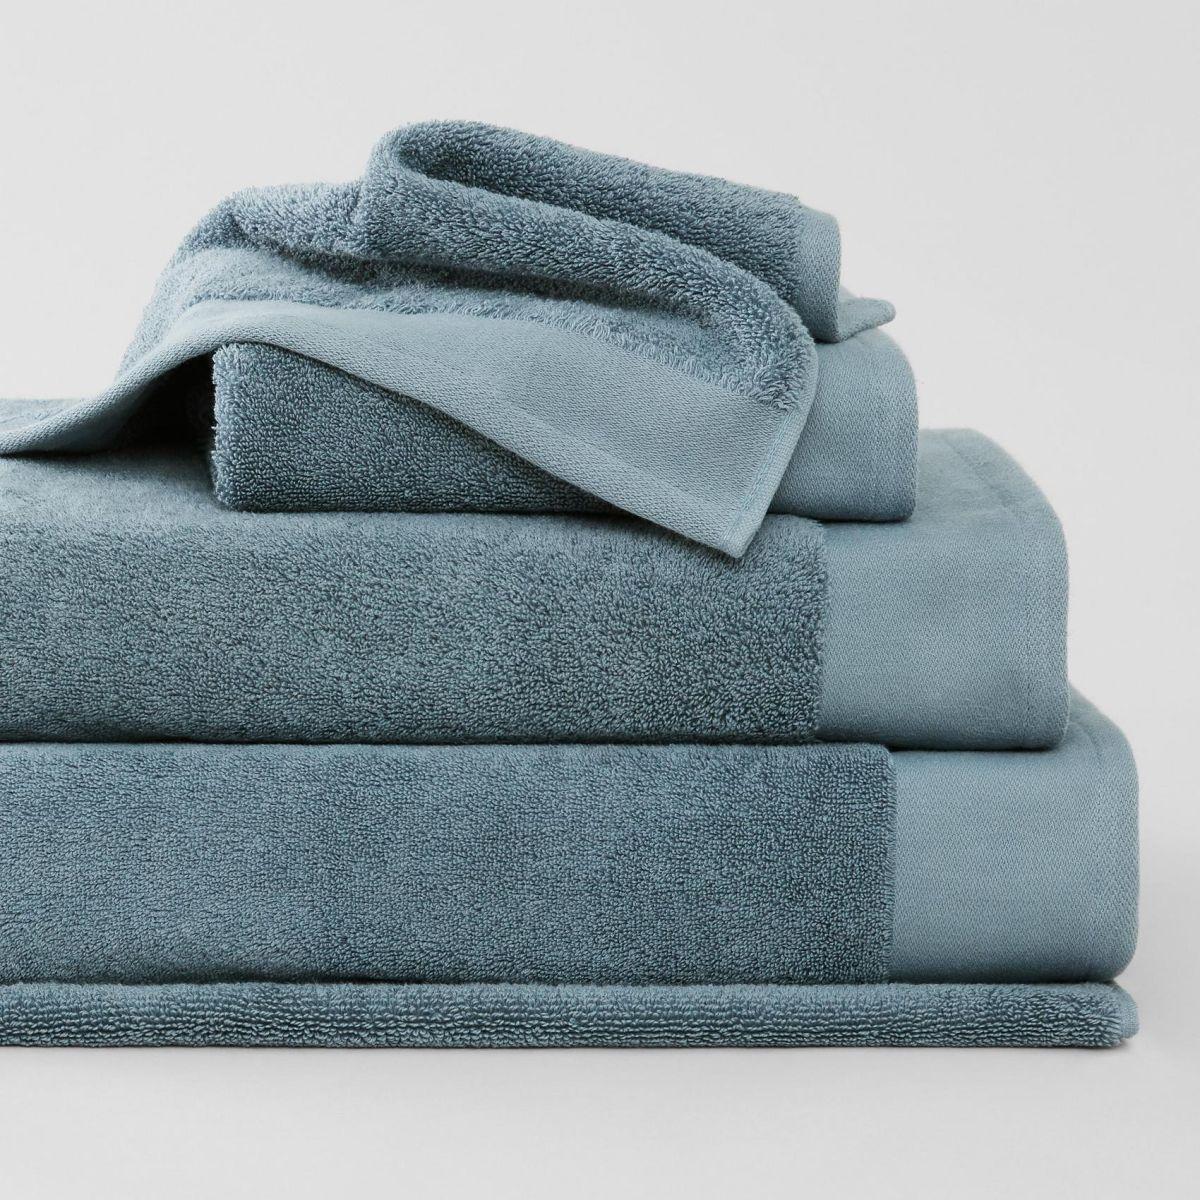 Luxury Retreat Towel Collection